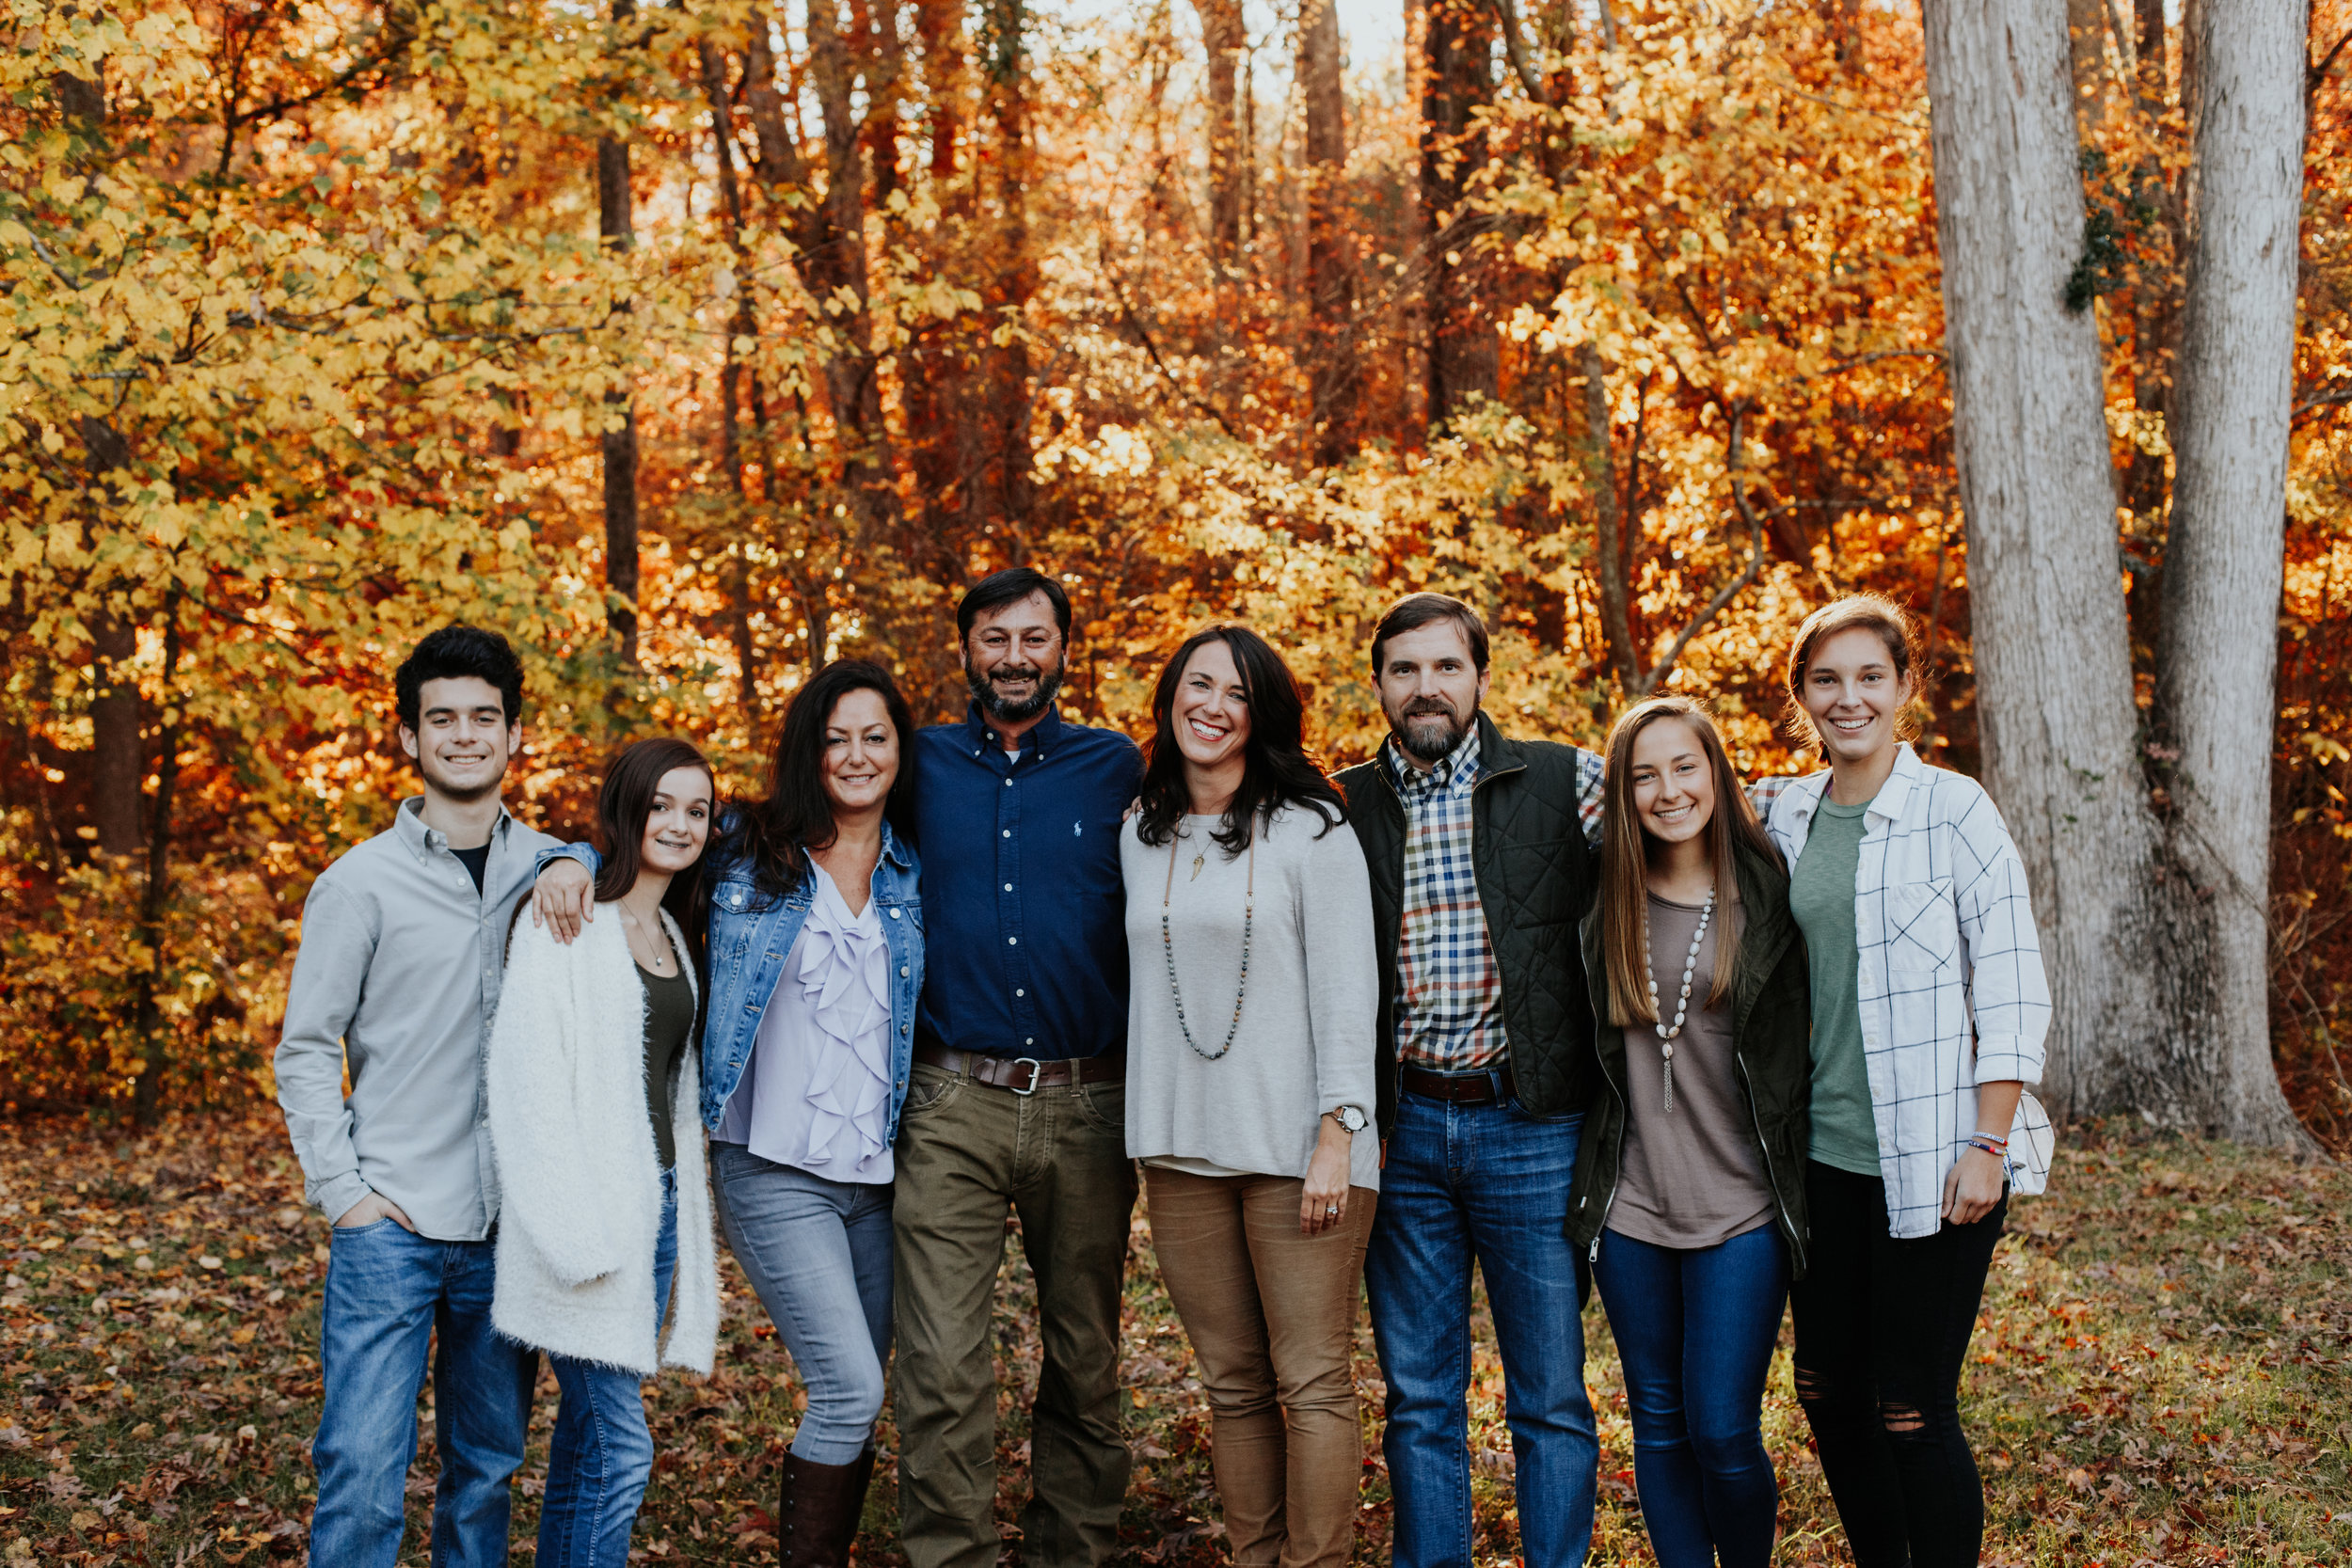 thedavisfamily-20.jpg